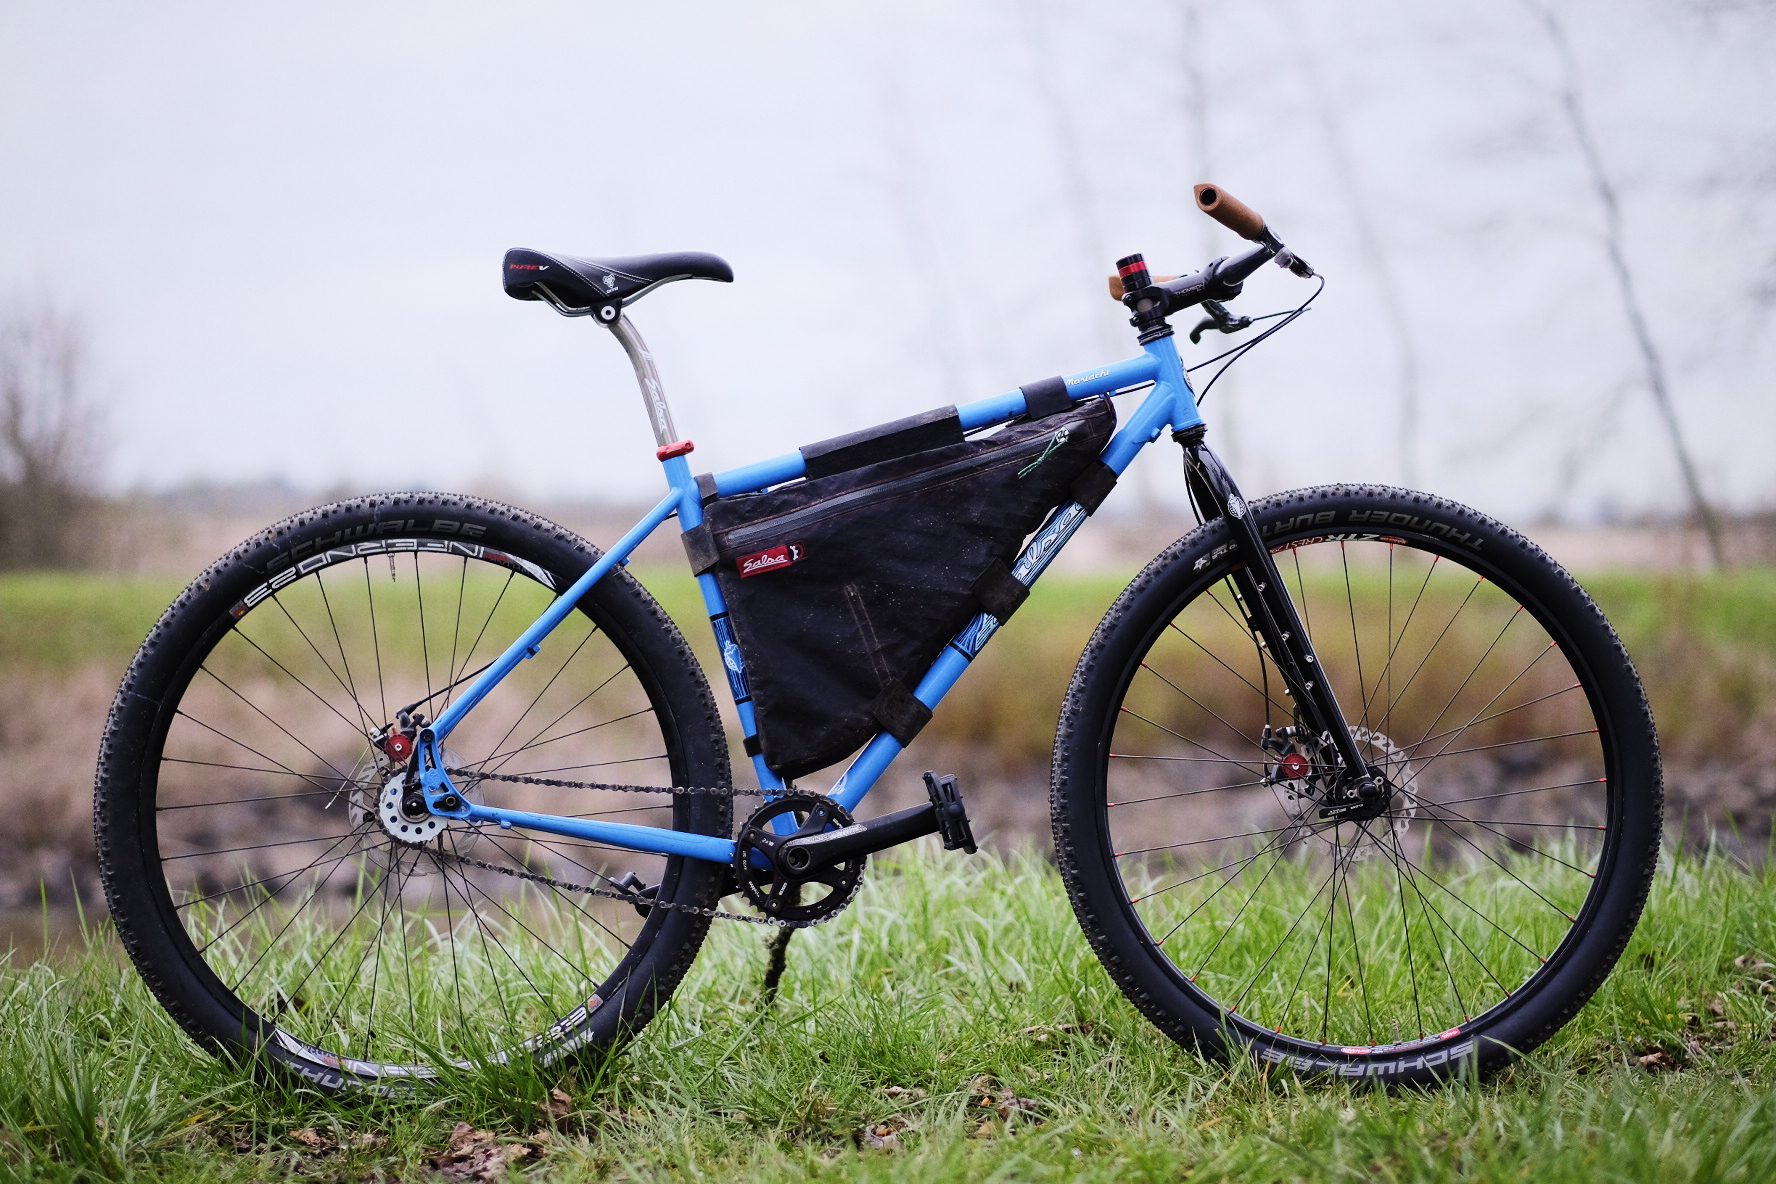 75. Brand new used bike day